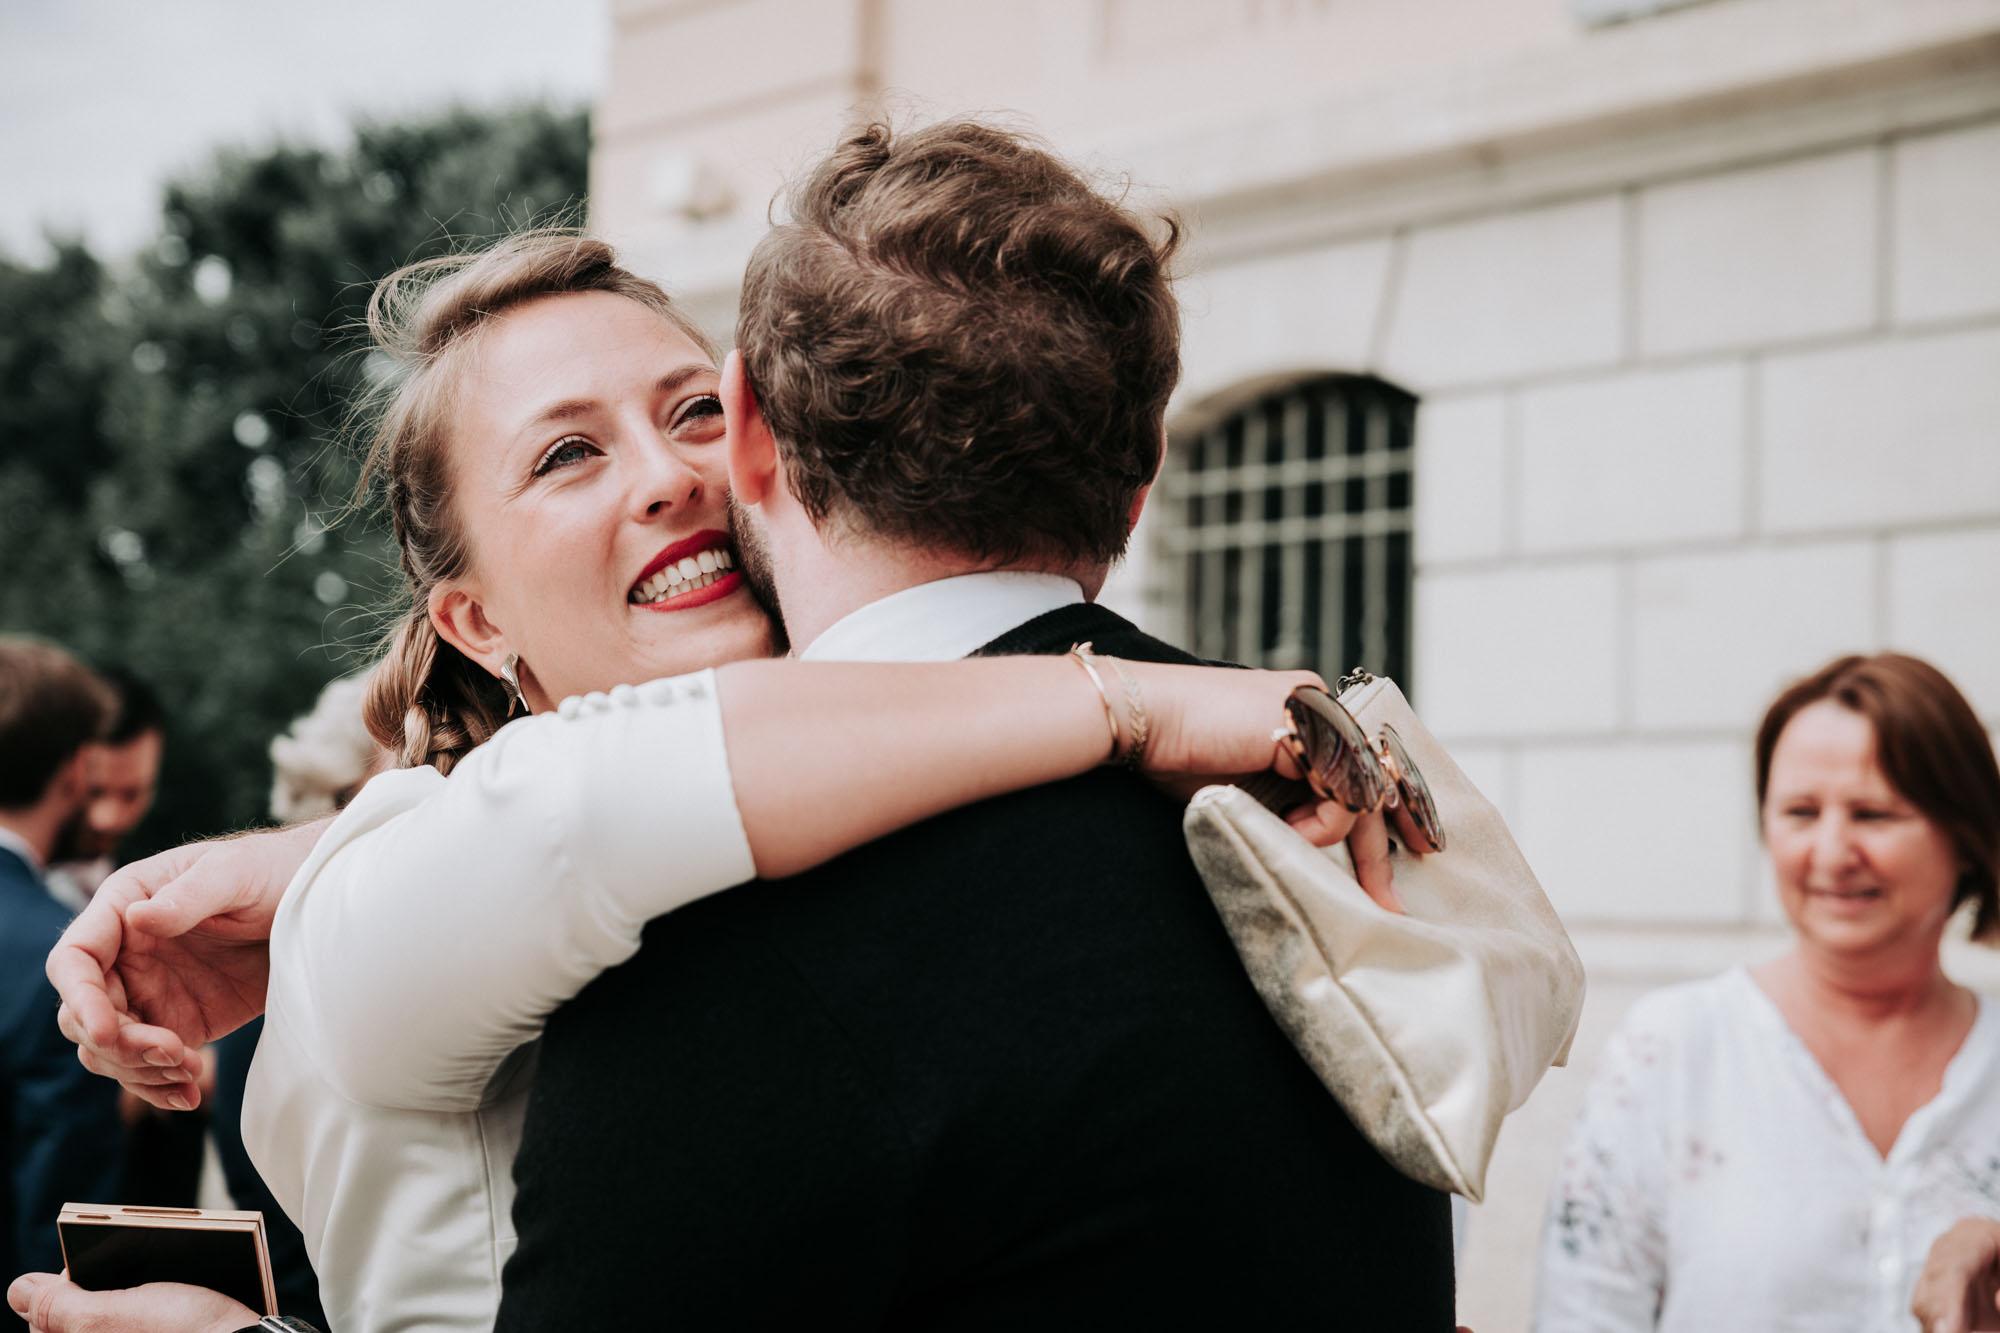 2018-07-21 - LD8_8788 - photographe mariage lyon - laurie diaz - www.lauriediazweeding.com.jpg